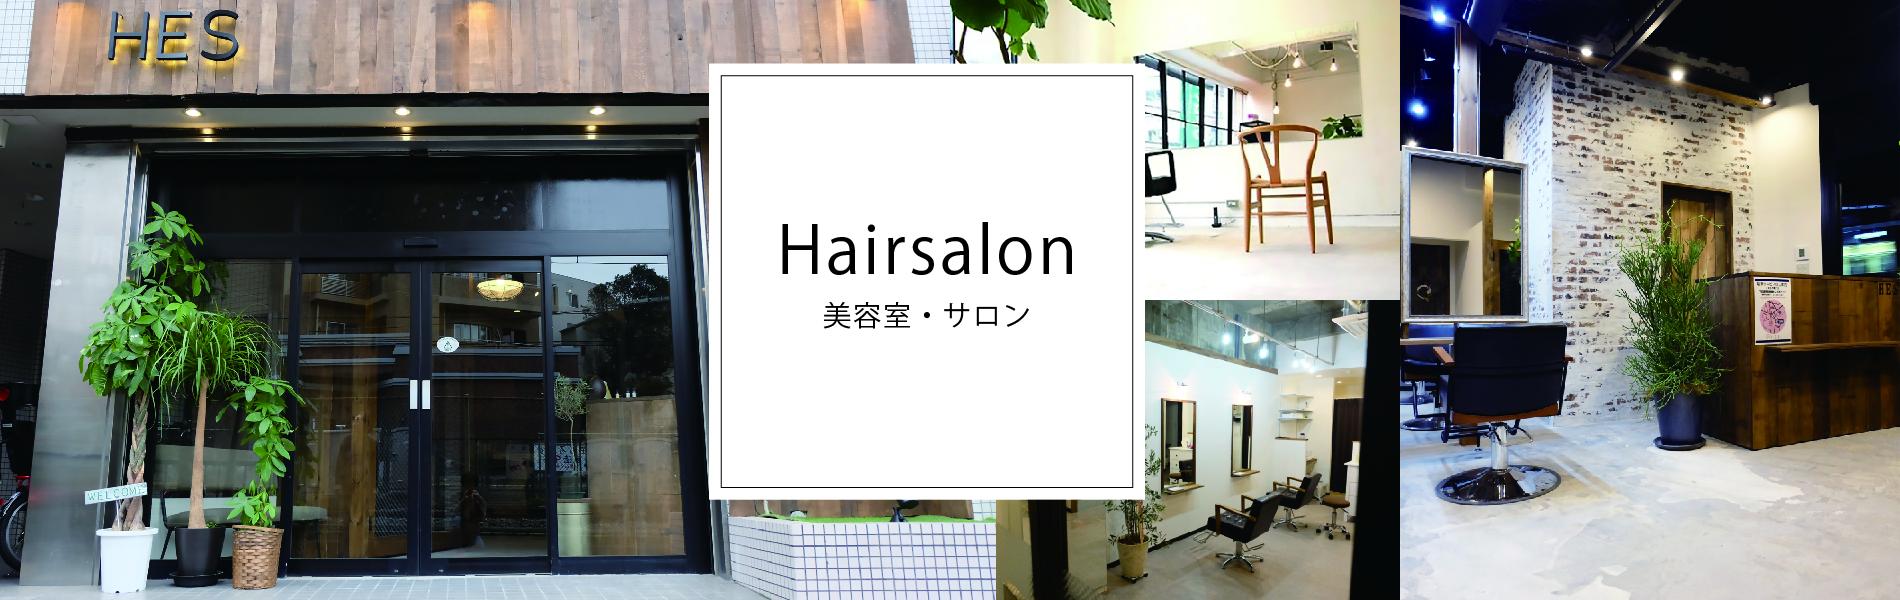 hairsalon-header